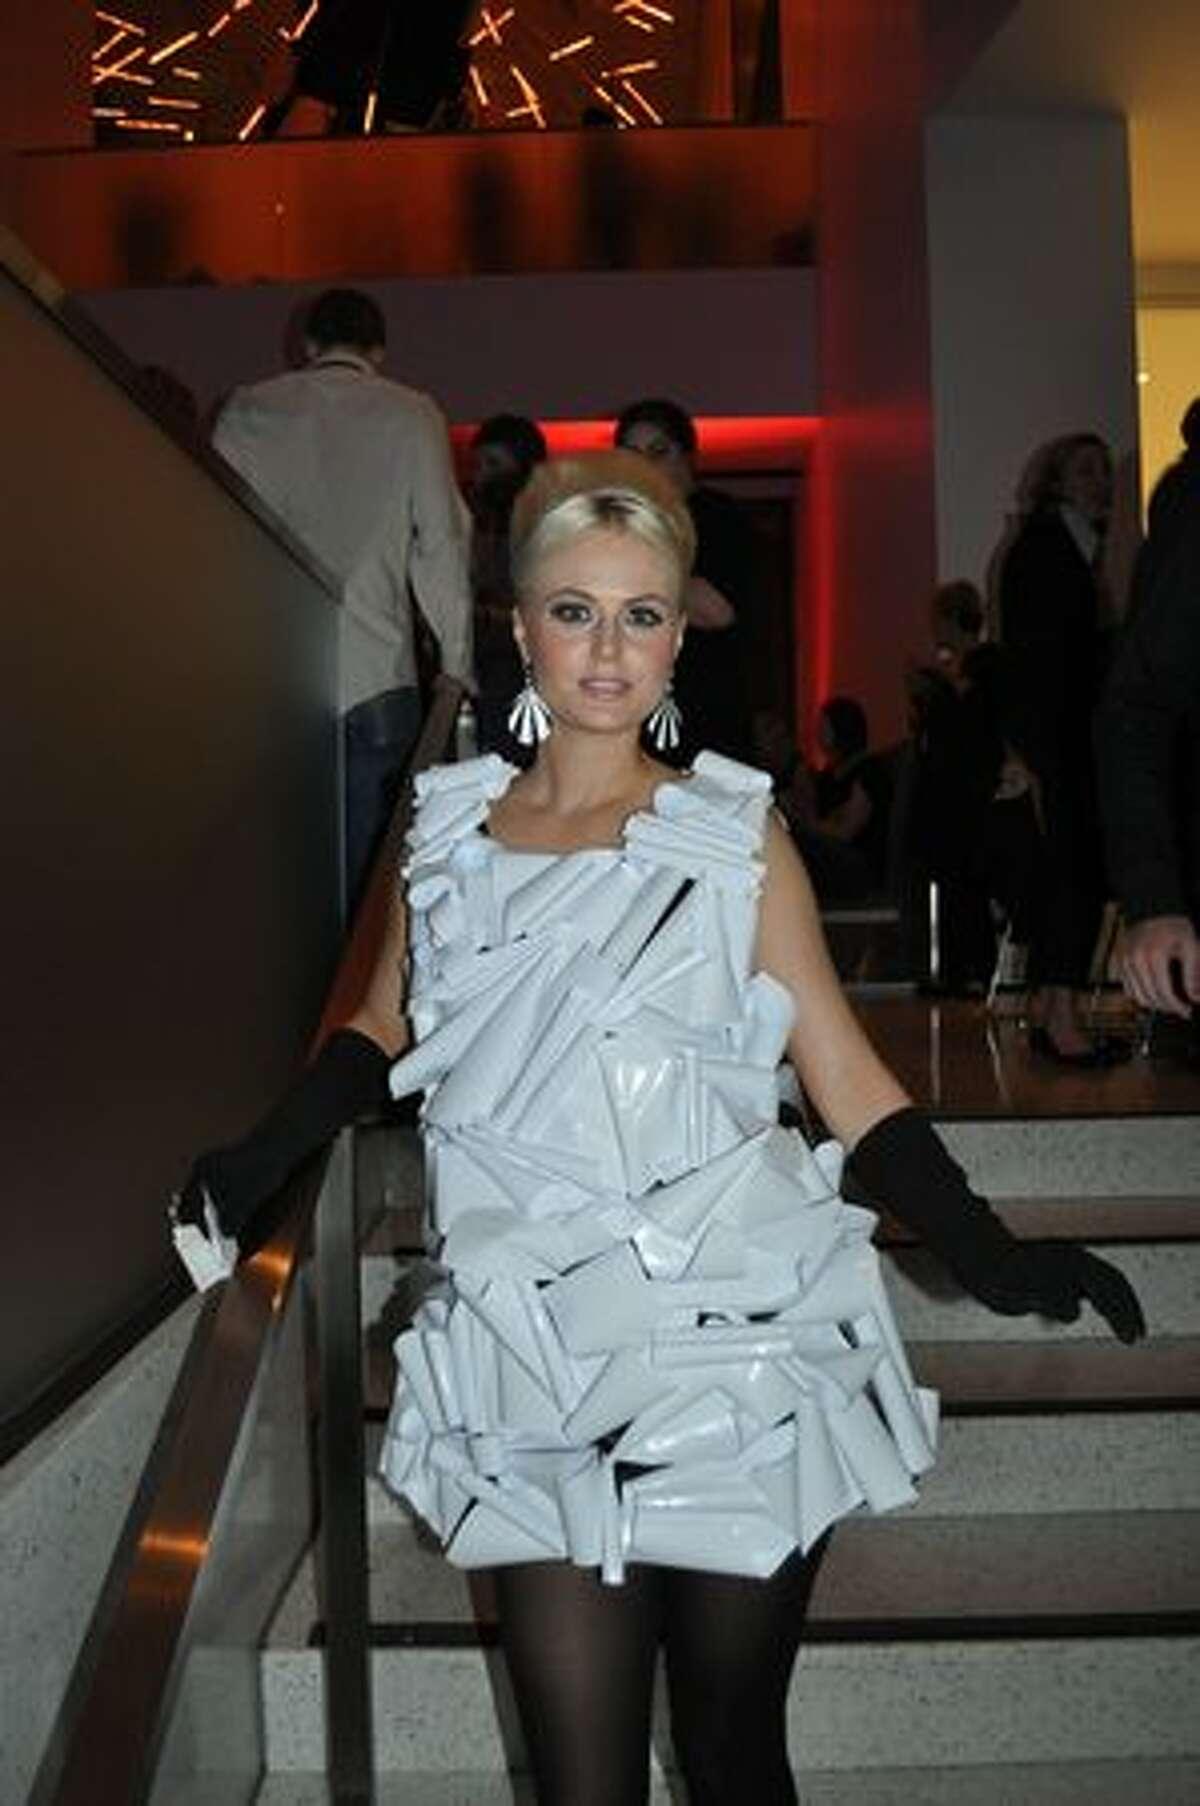 A model at the SAM Remix Andy Warhol event Saturday. (Kelly Hendrickson/UW News Lab)